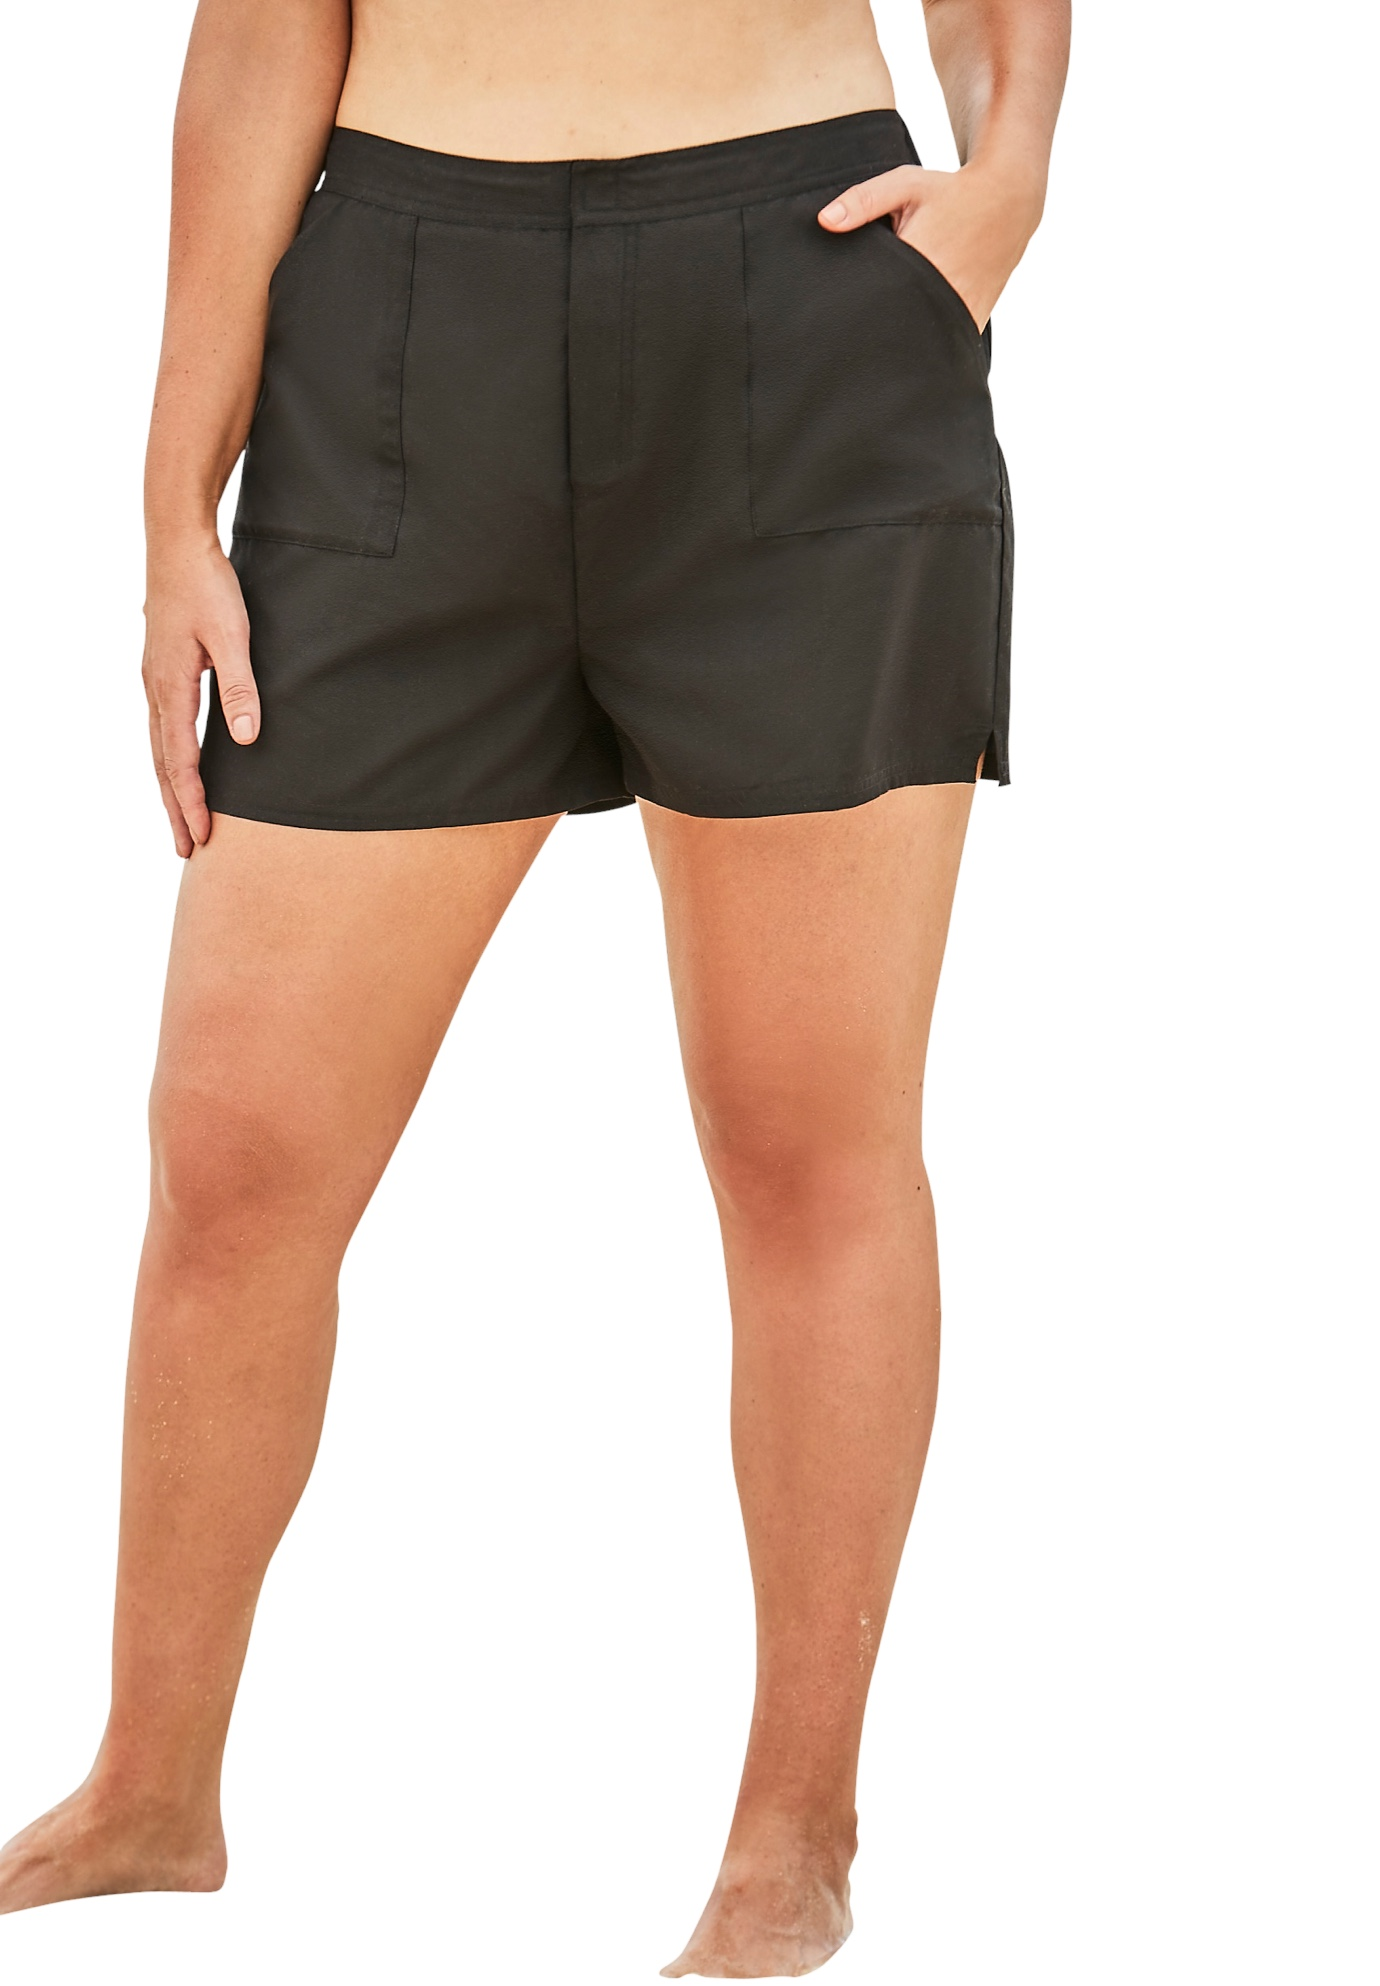 Plus Size Women's Cargo Swim Shorts with Side Slits by Swim 365 in Black